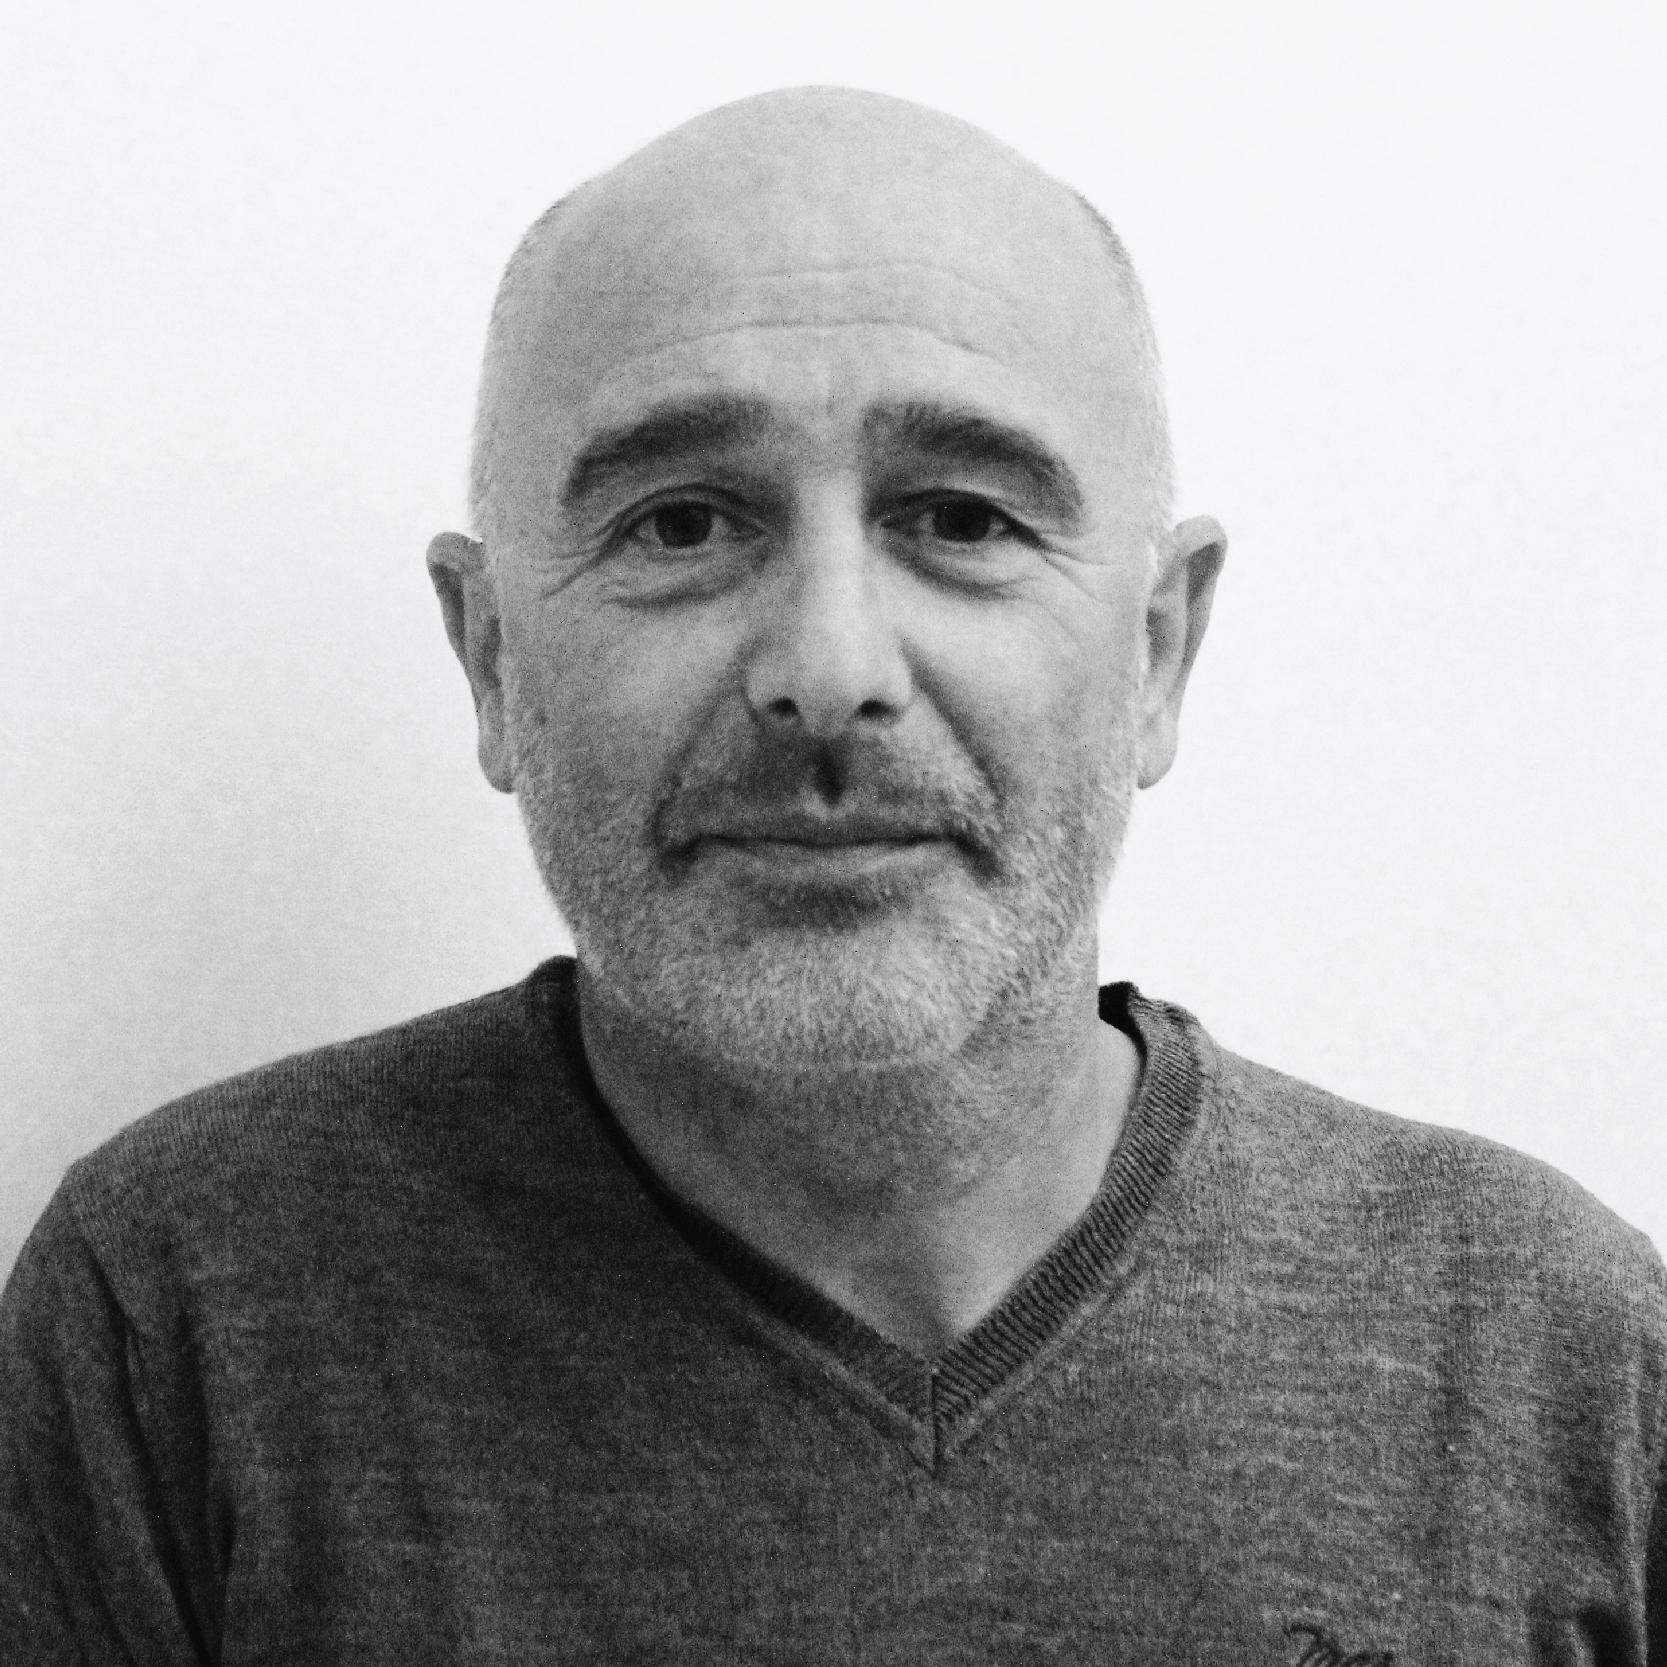 Geom. Vito Iannuzzi